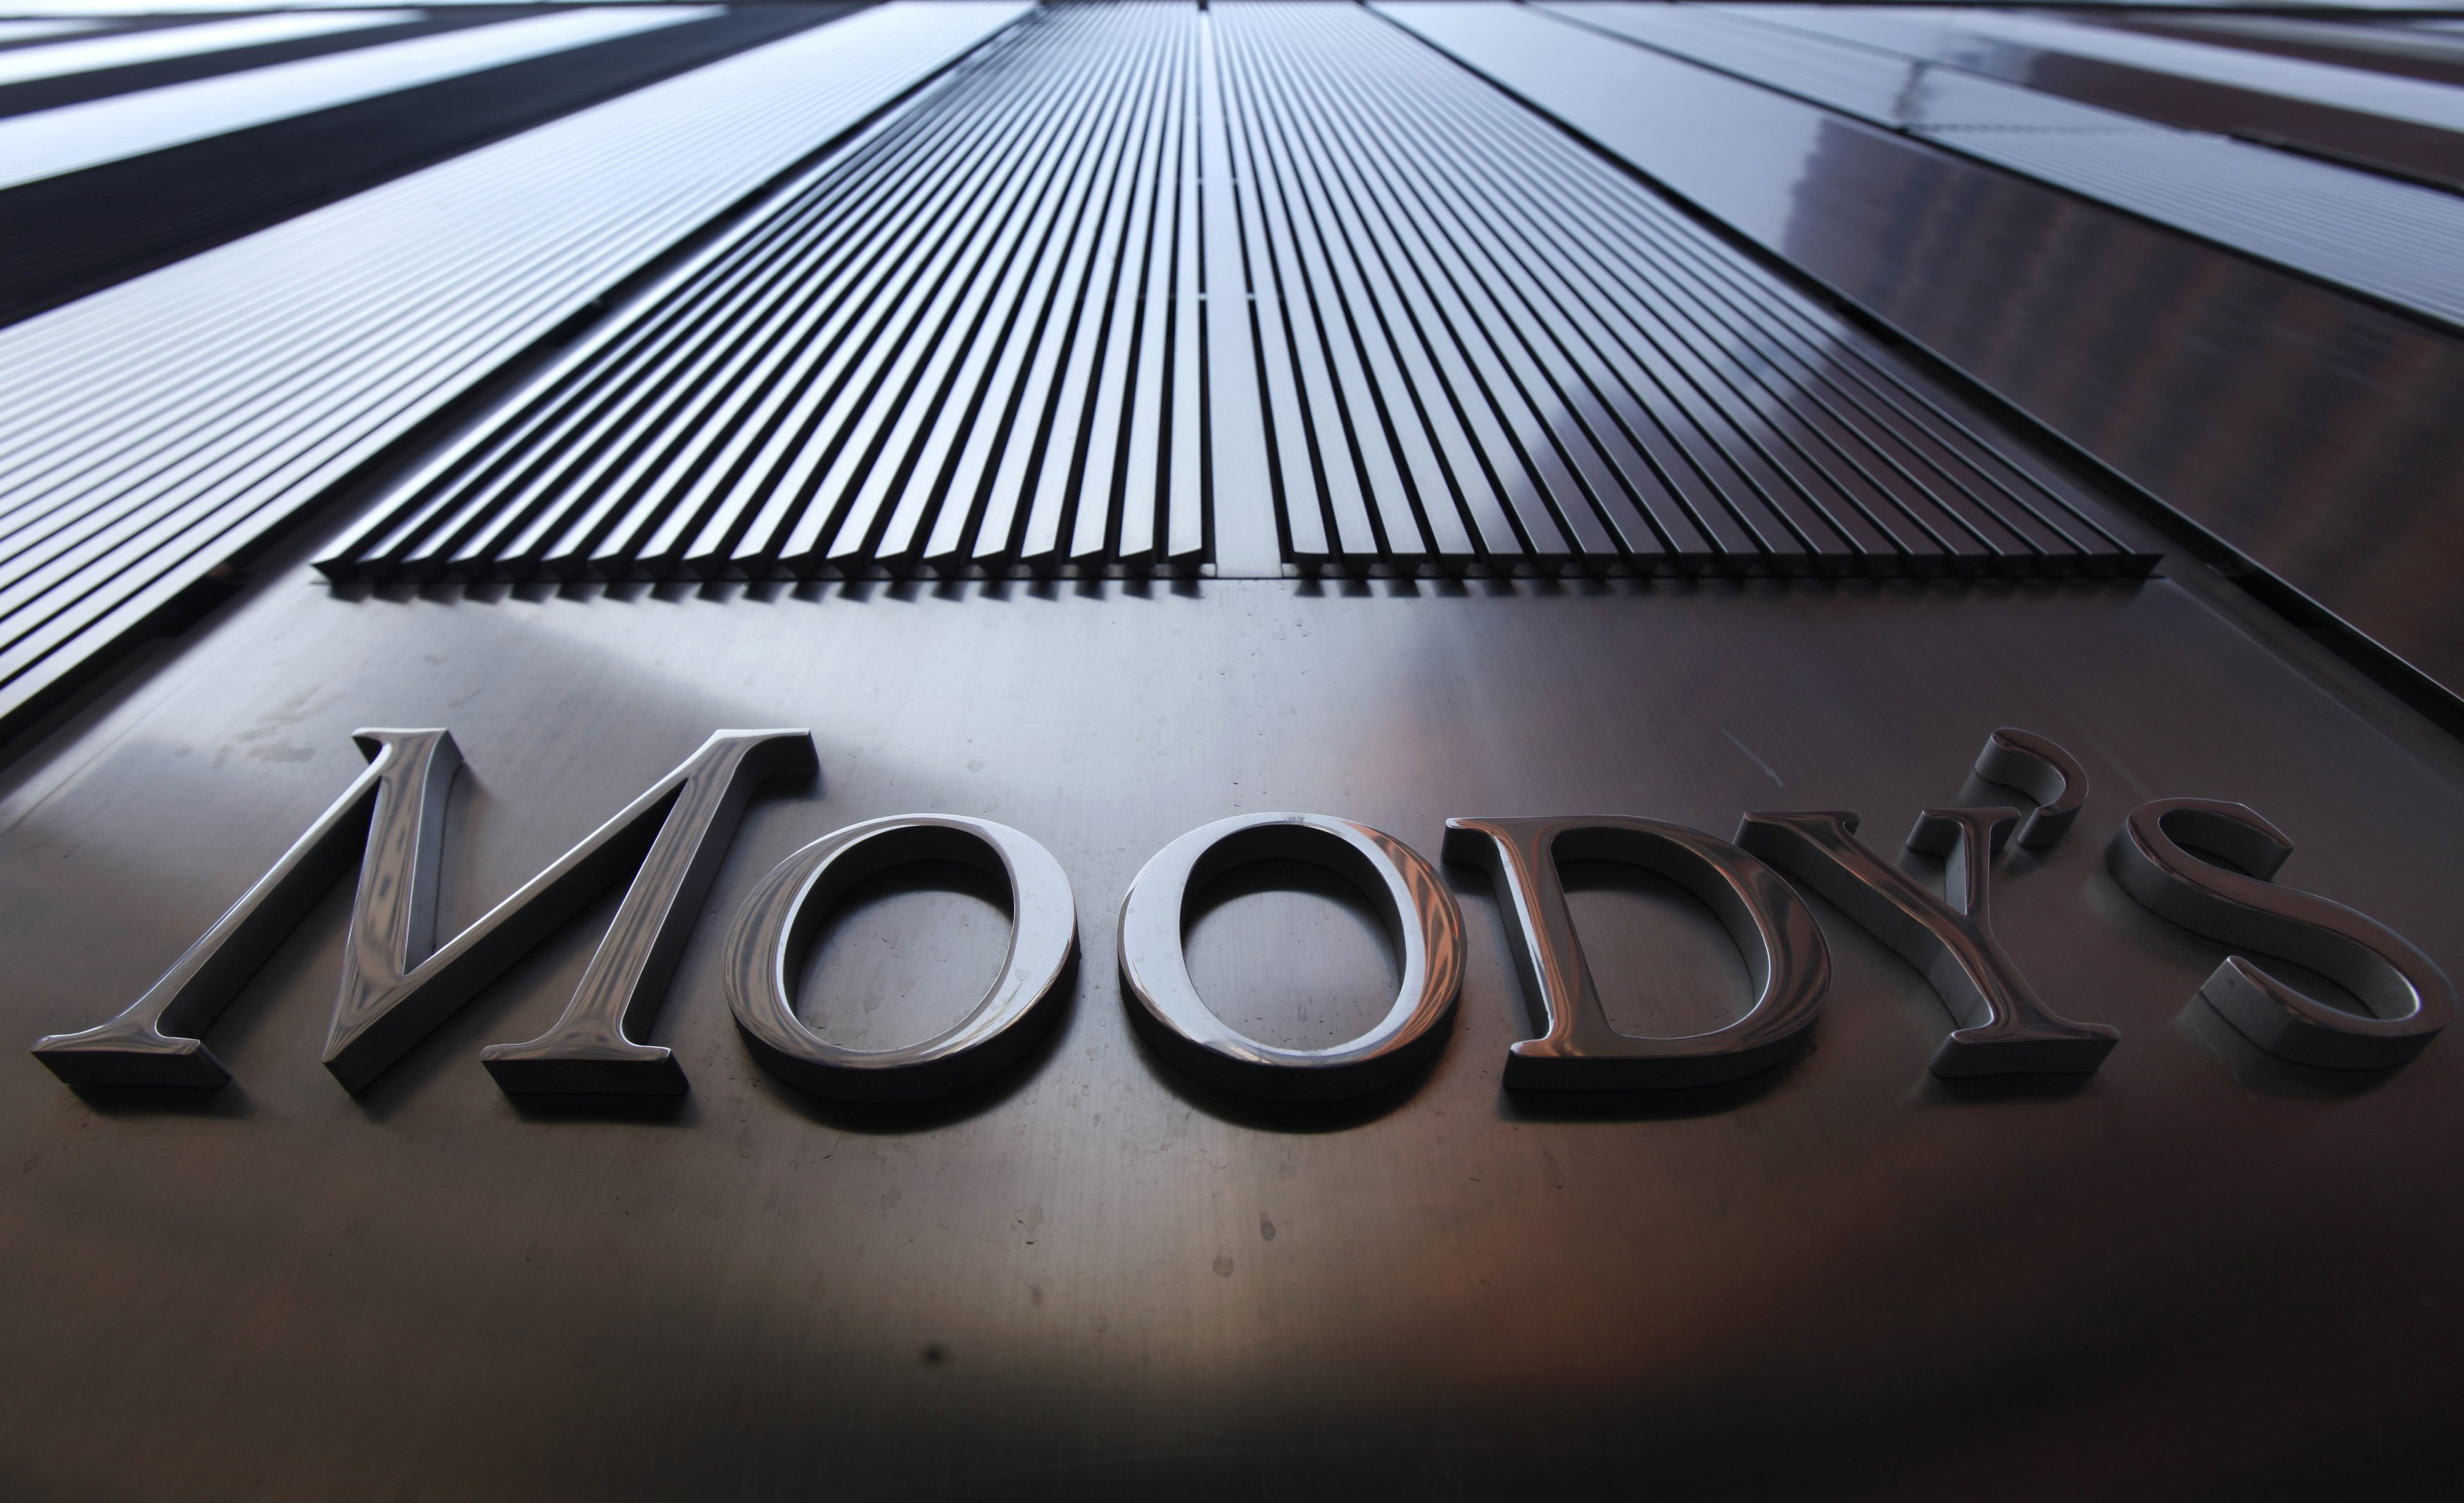 Moody's: Ημιτελής η διόρθωση από τις μεταρρυθμίσεις στην ευρωπεριφέρεια   tovima.gr